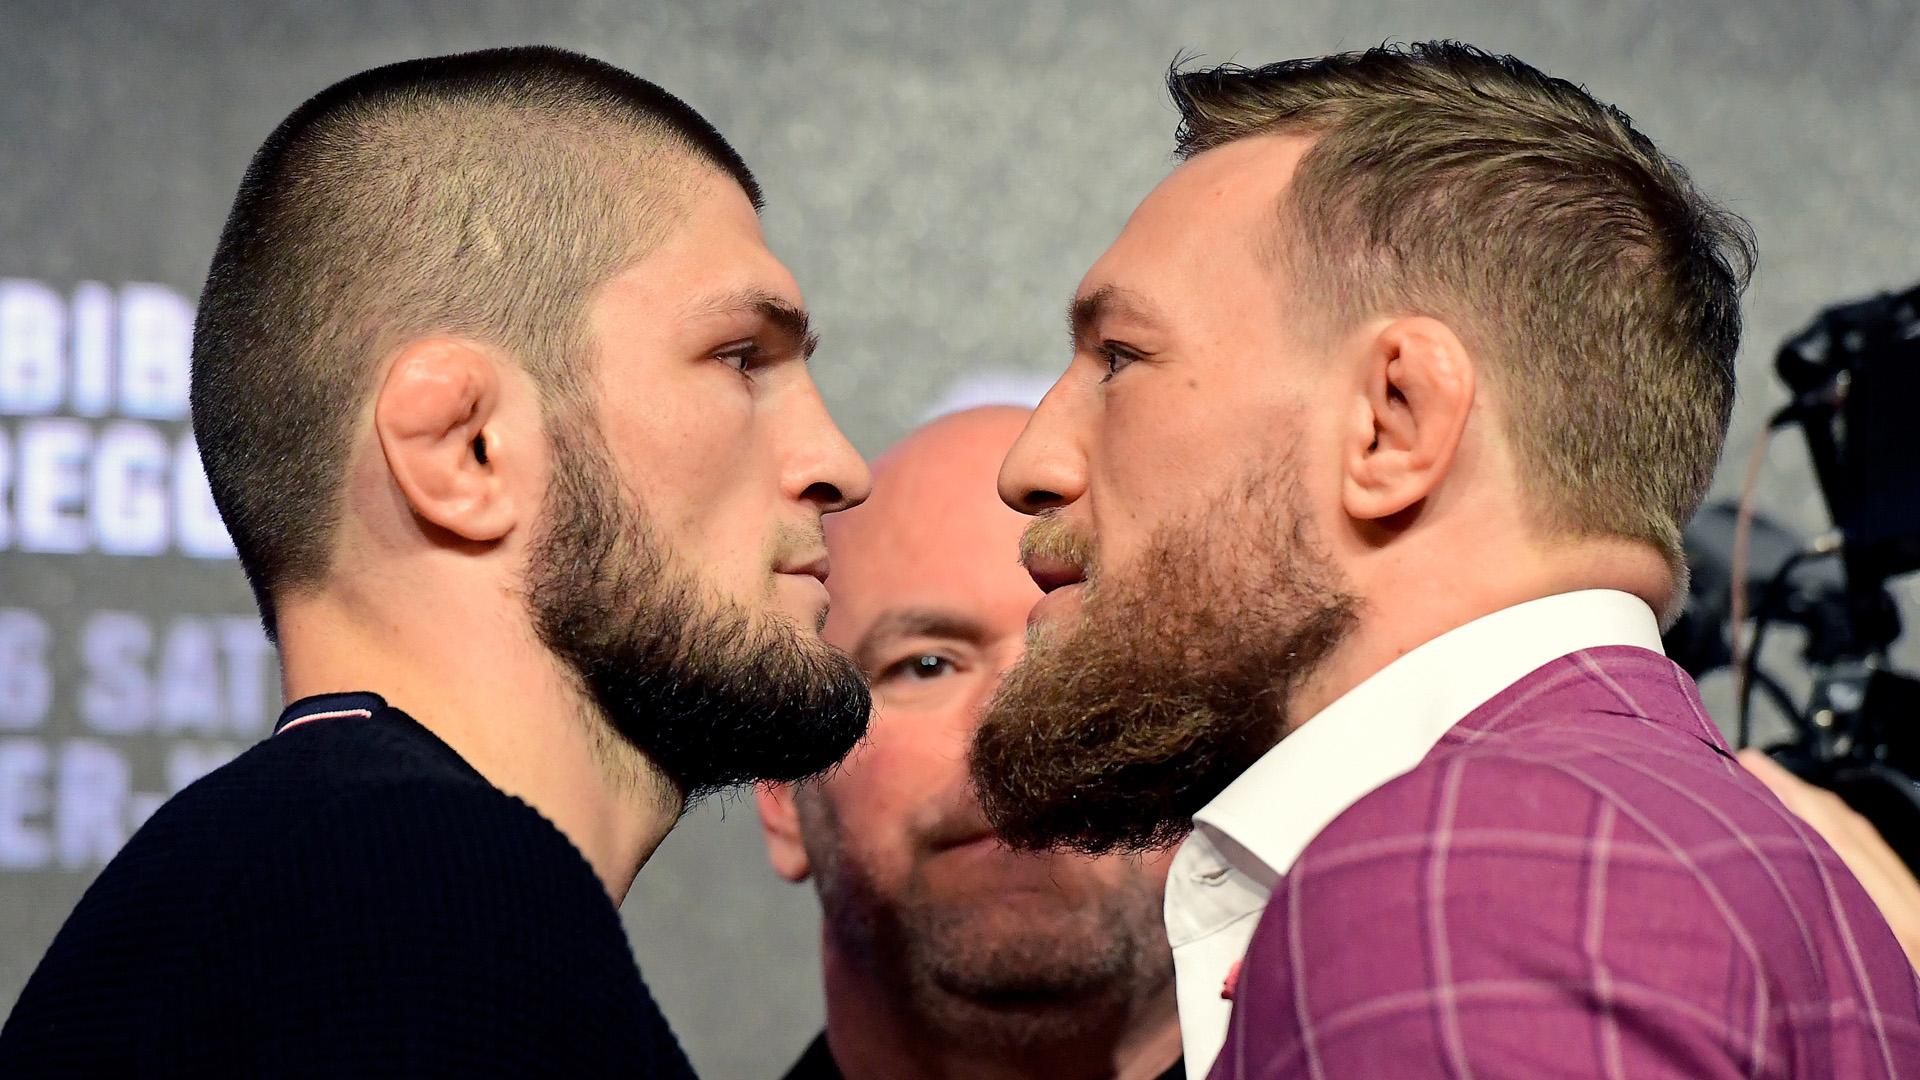 UFC-Eskalation: Conor McGregor verliert, Khabib Nurmagomedov rastet völlig aus